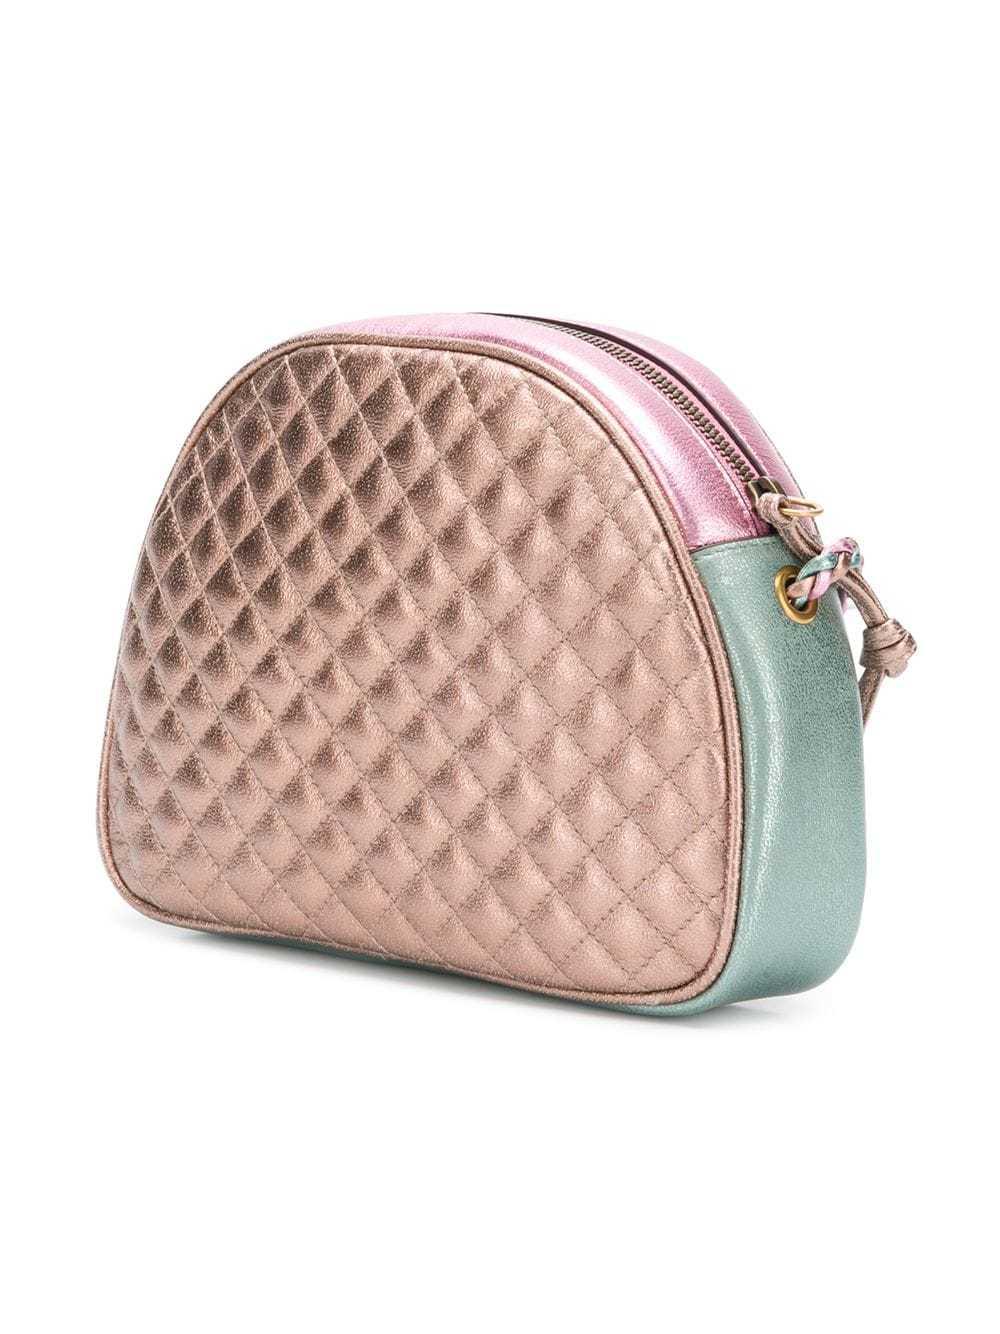 2d57bfb3330 Gucci Metallic Colour Block Clutch Bag